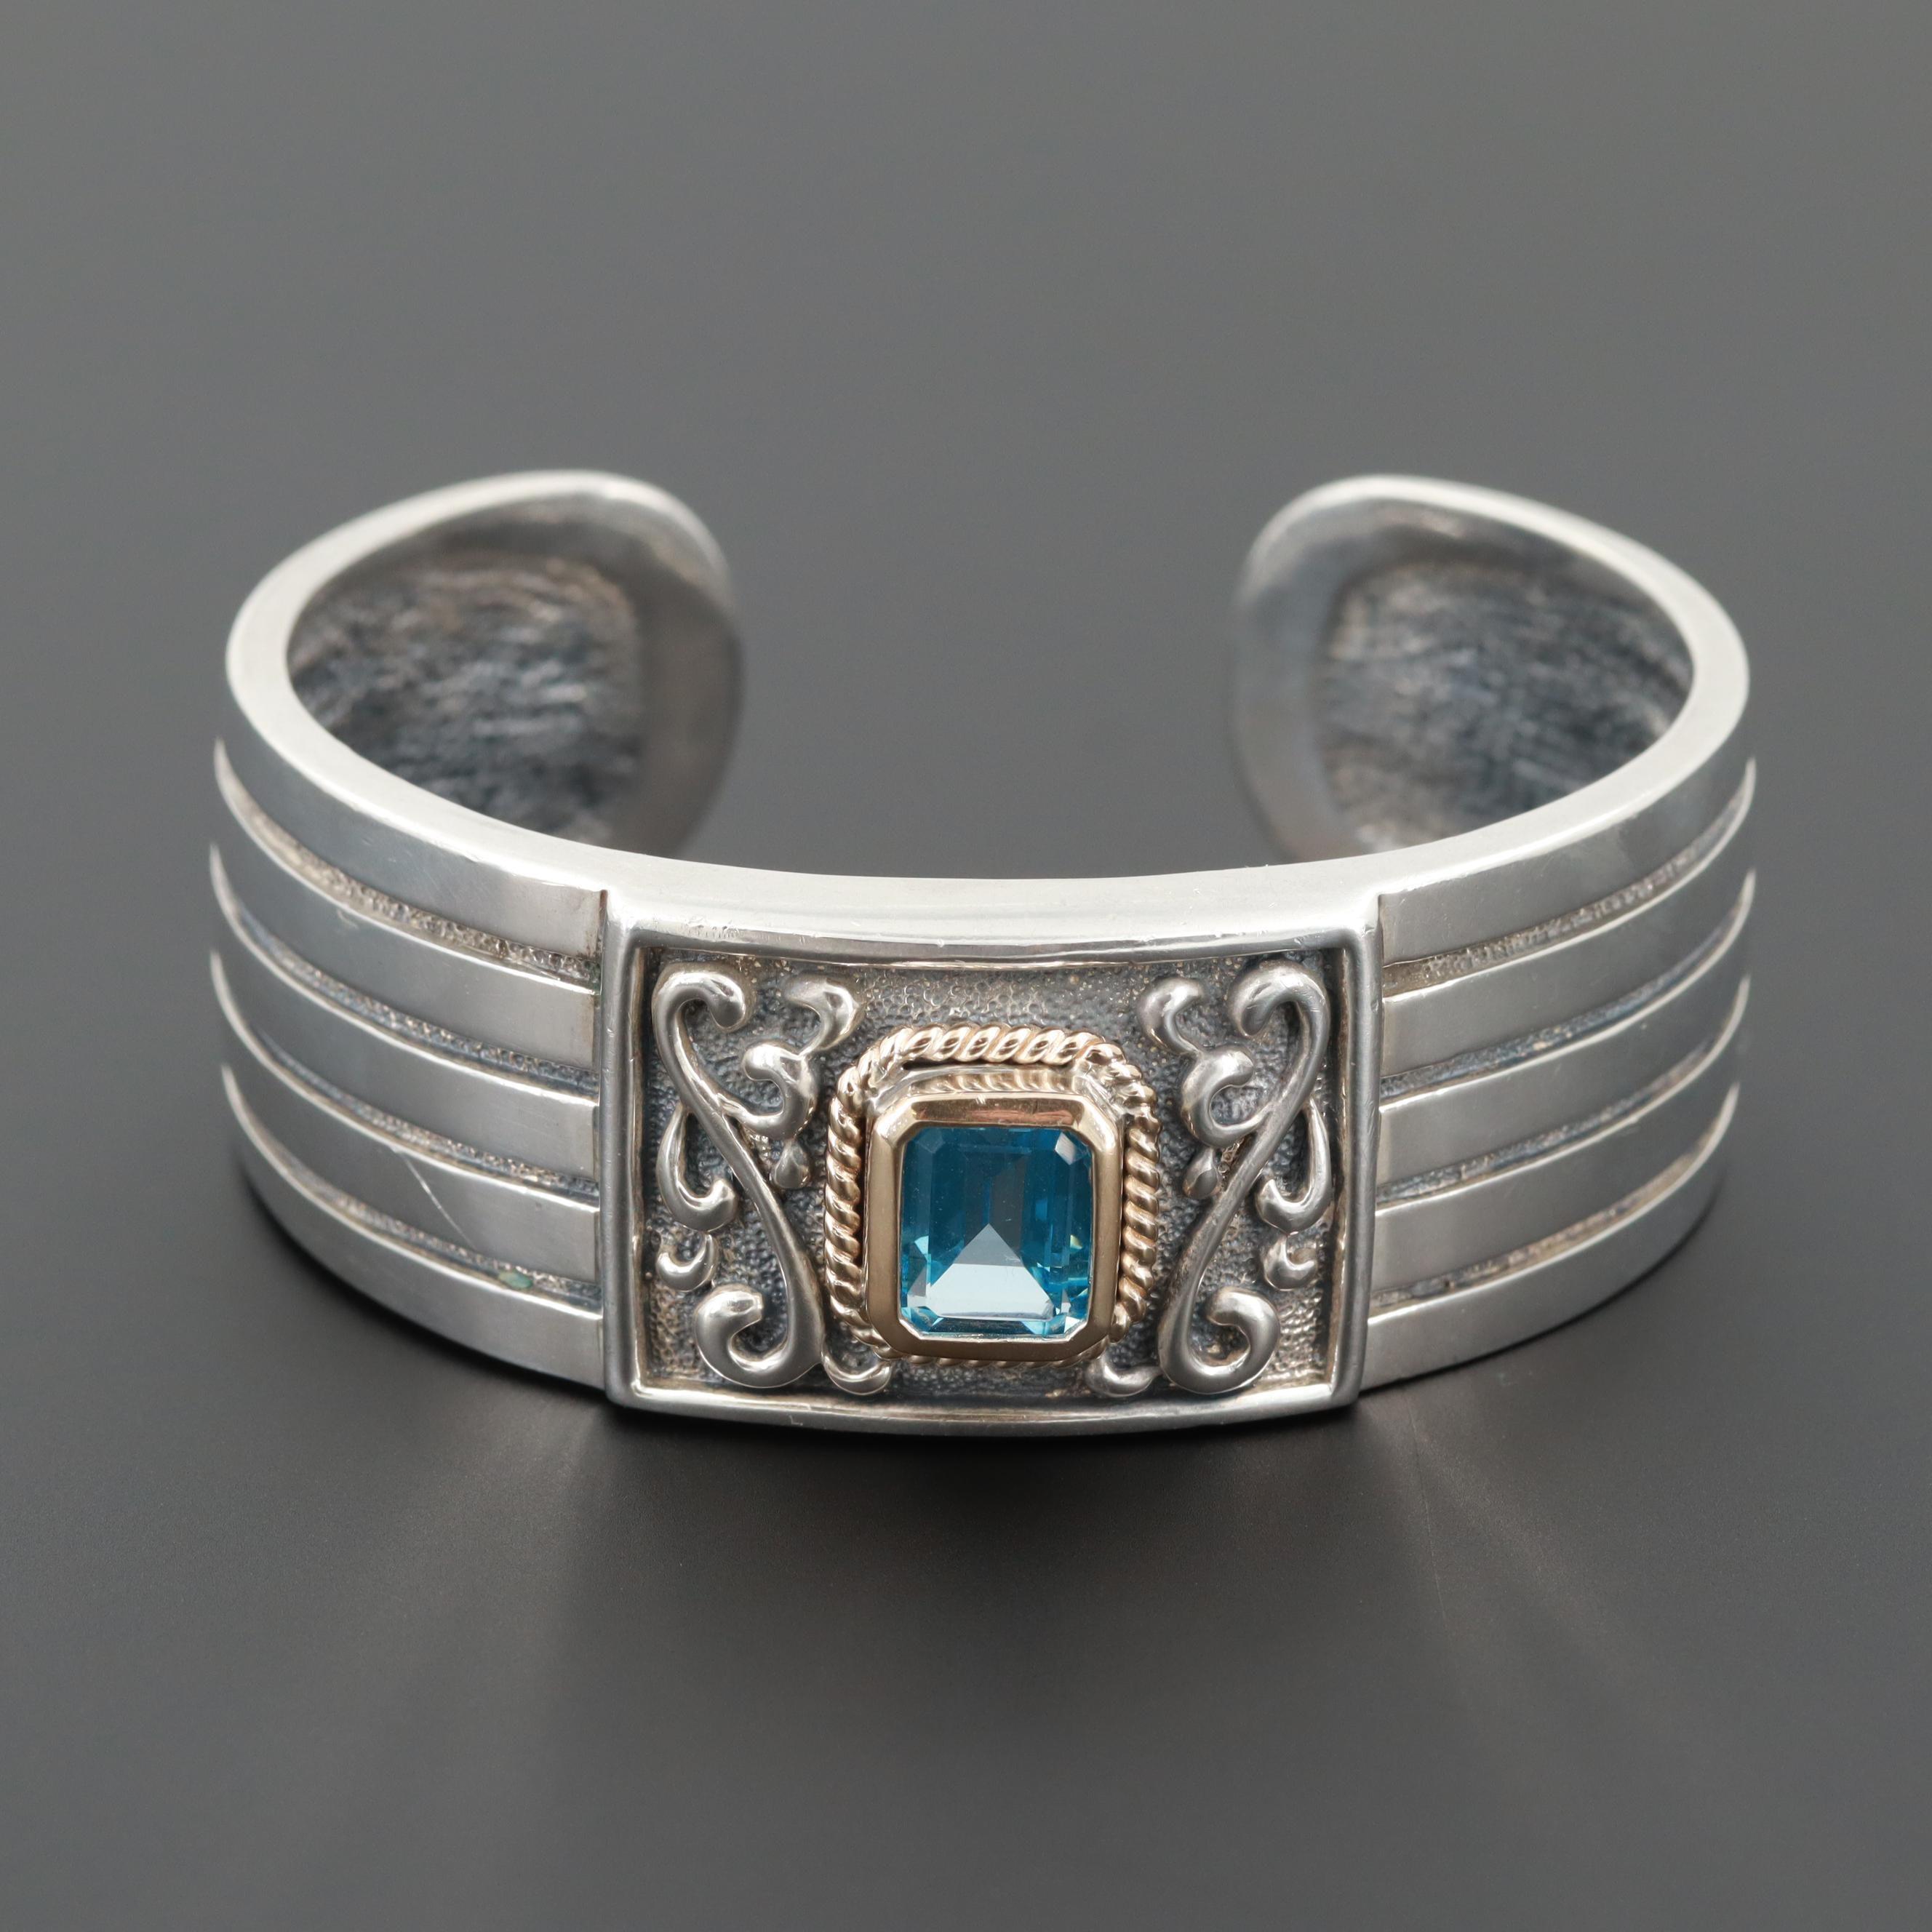 Sterling Silver Topaz Cuff Bracelet With Carved Design